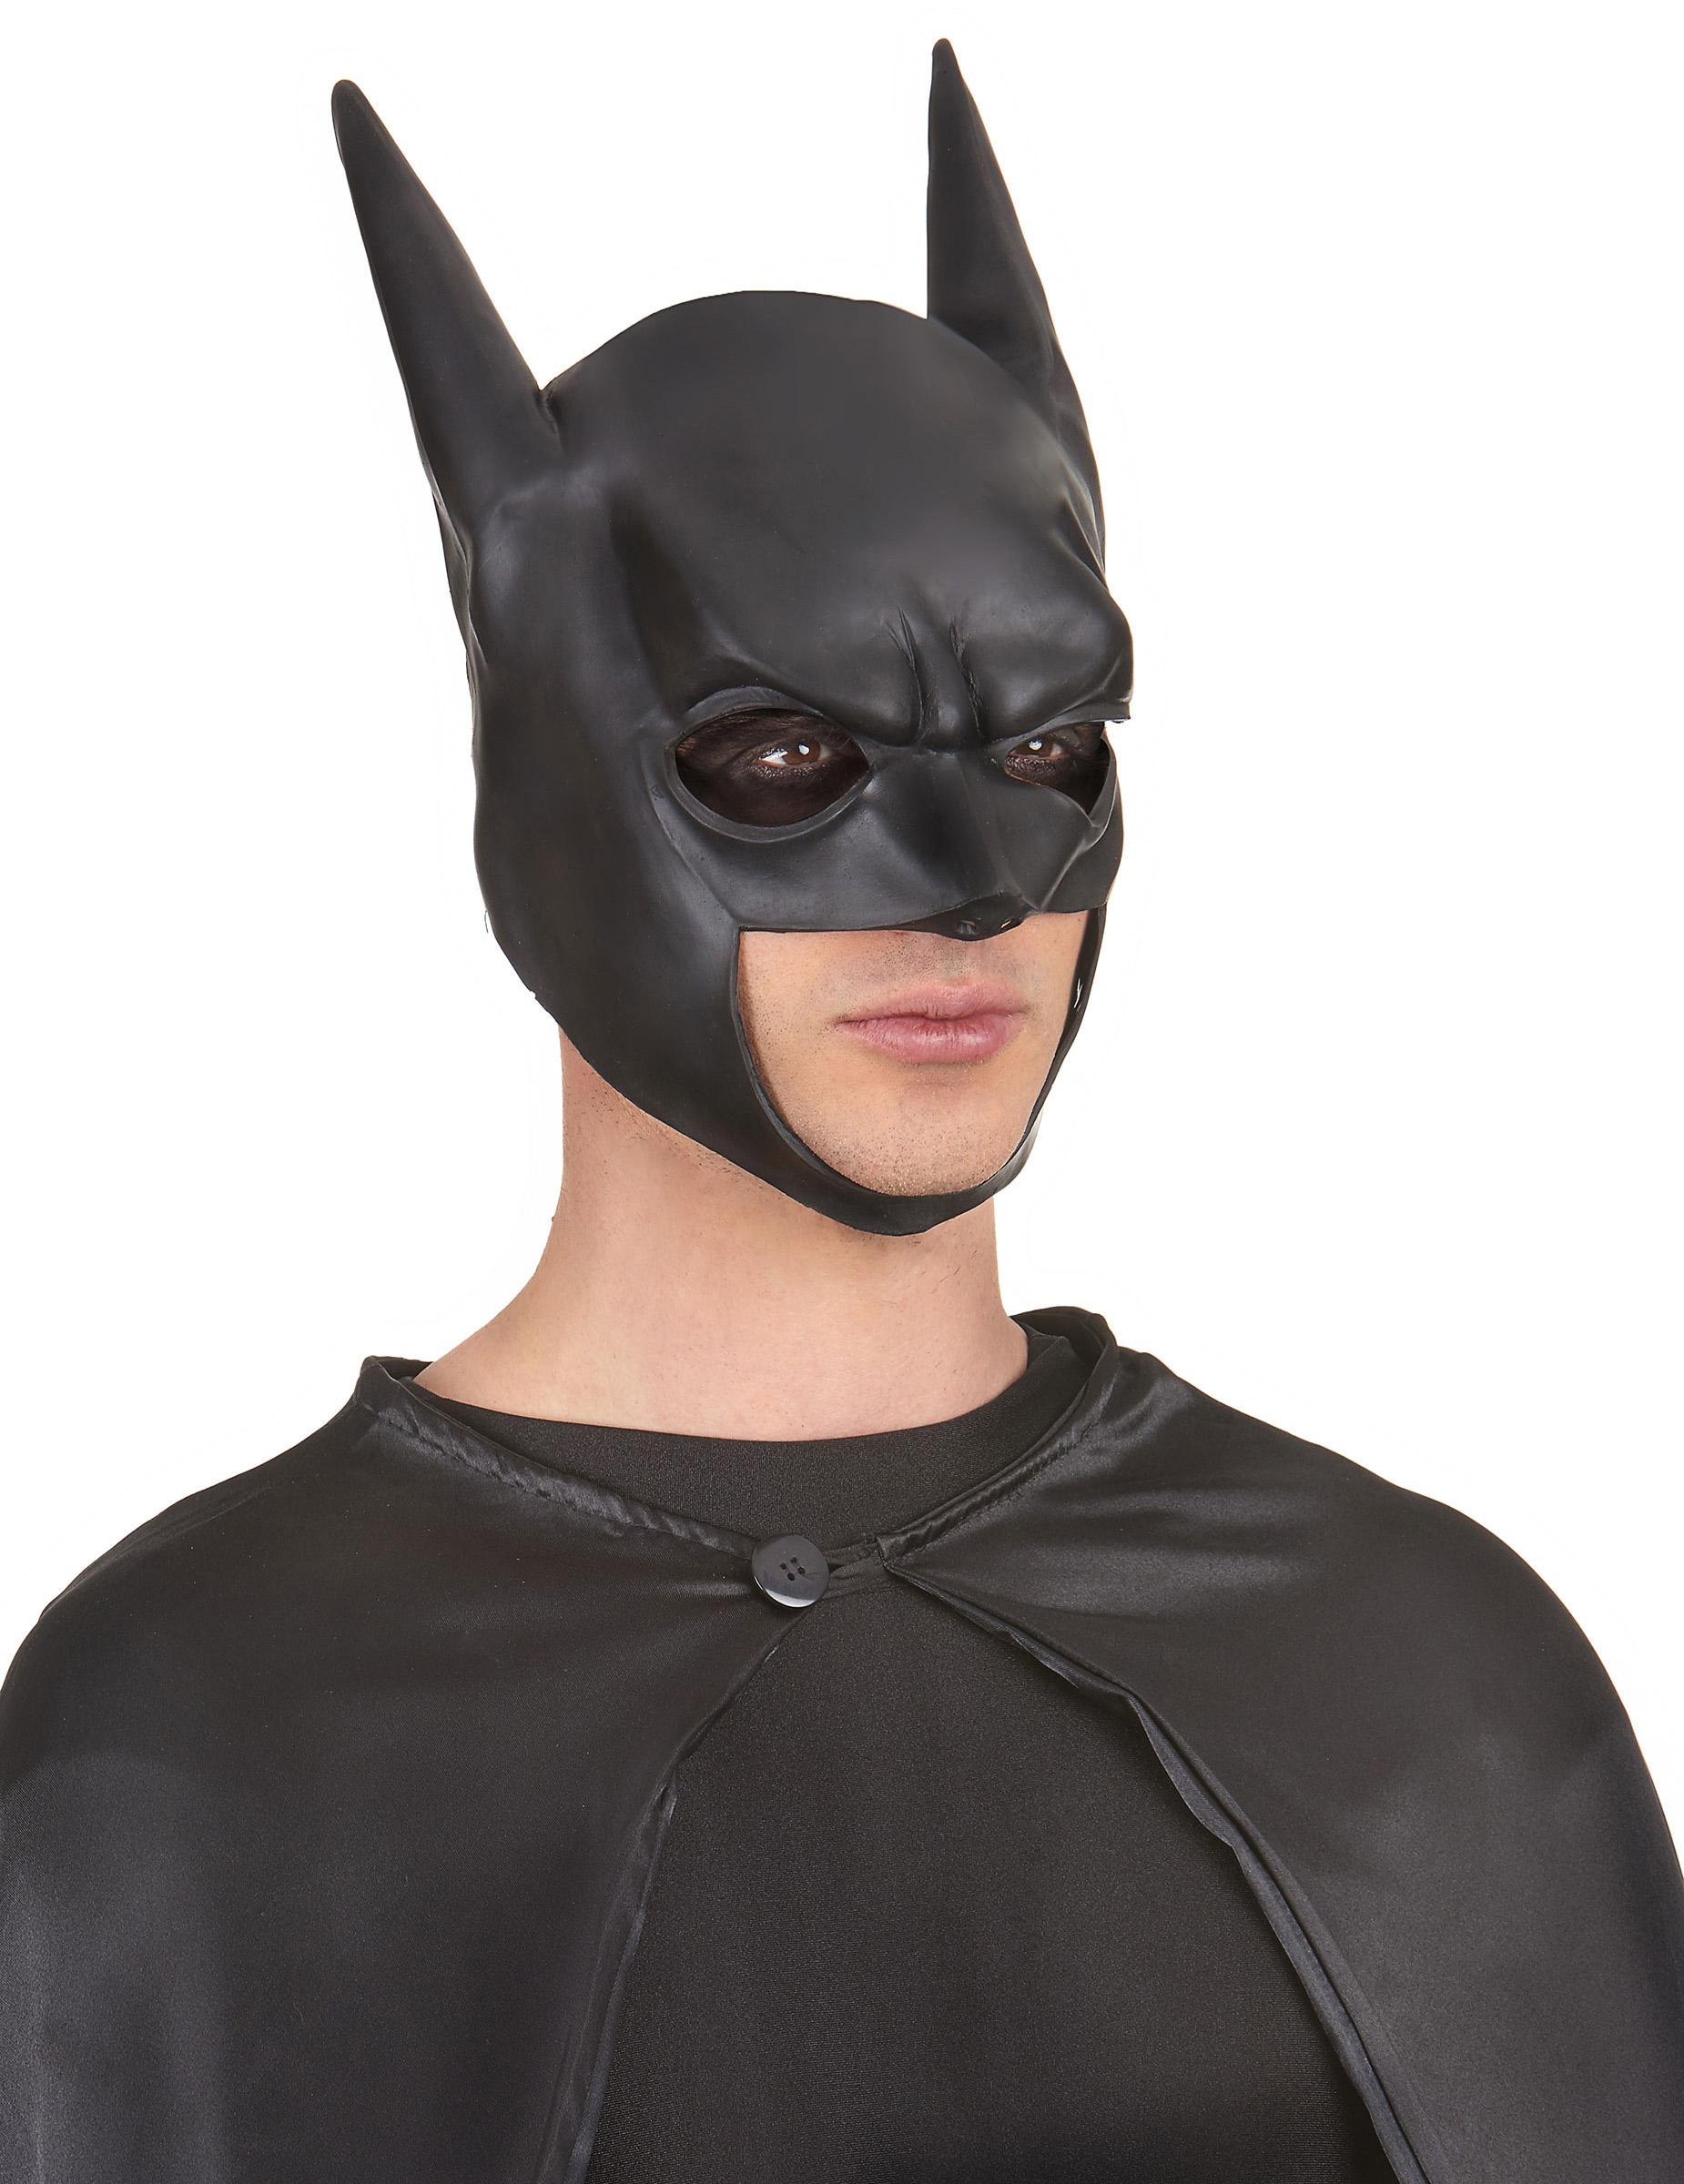 batman maske f r erwachsene masken und g nstige faschingskost me vegaoo. Black Bedroom Furniture Sets. Home Design Ideas